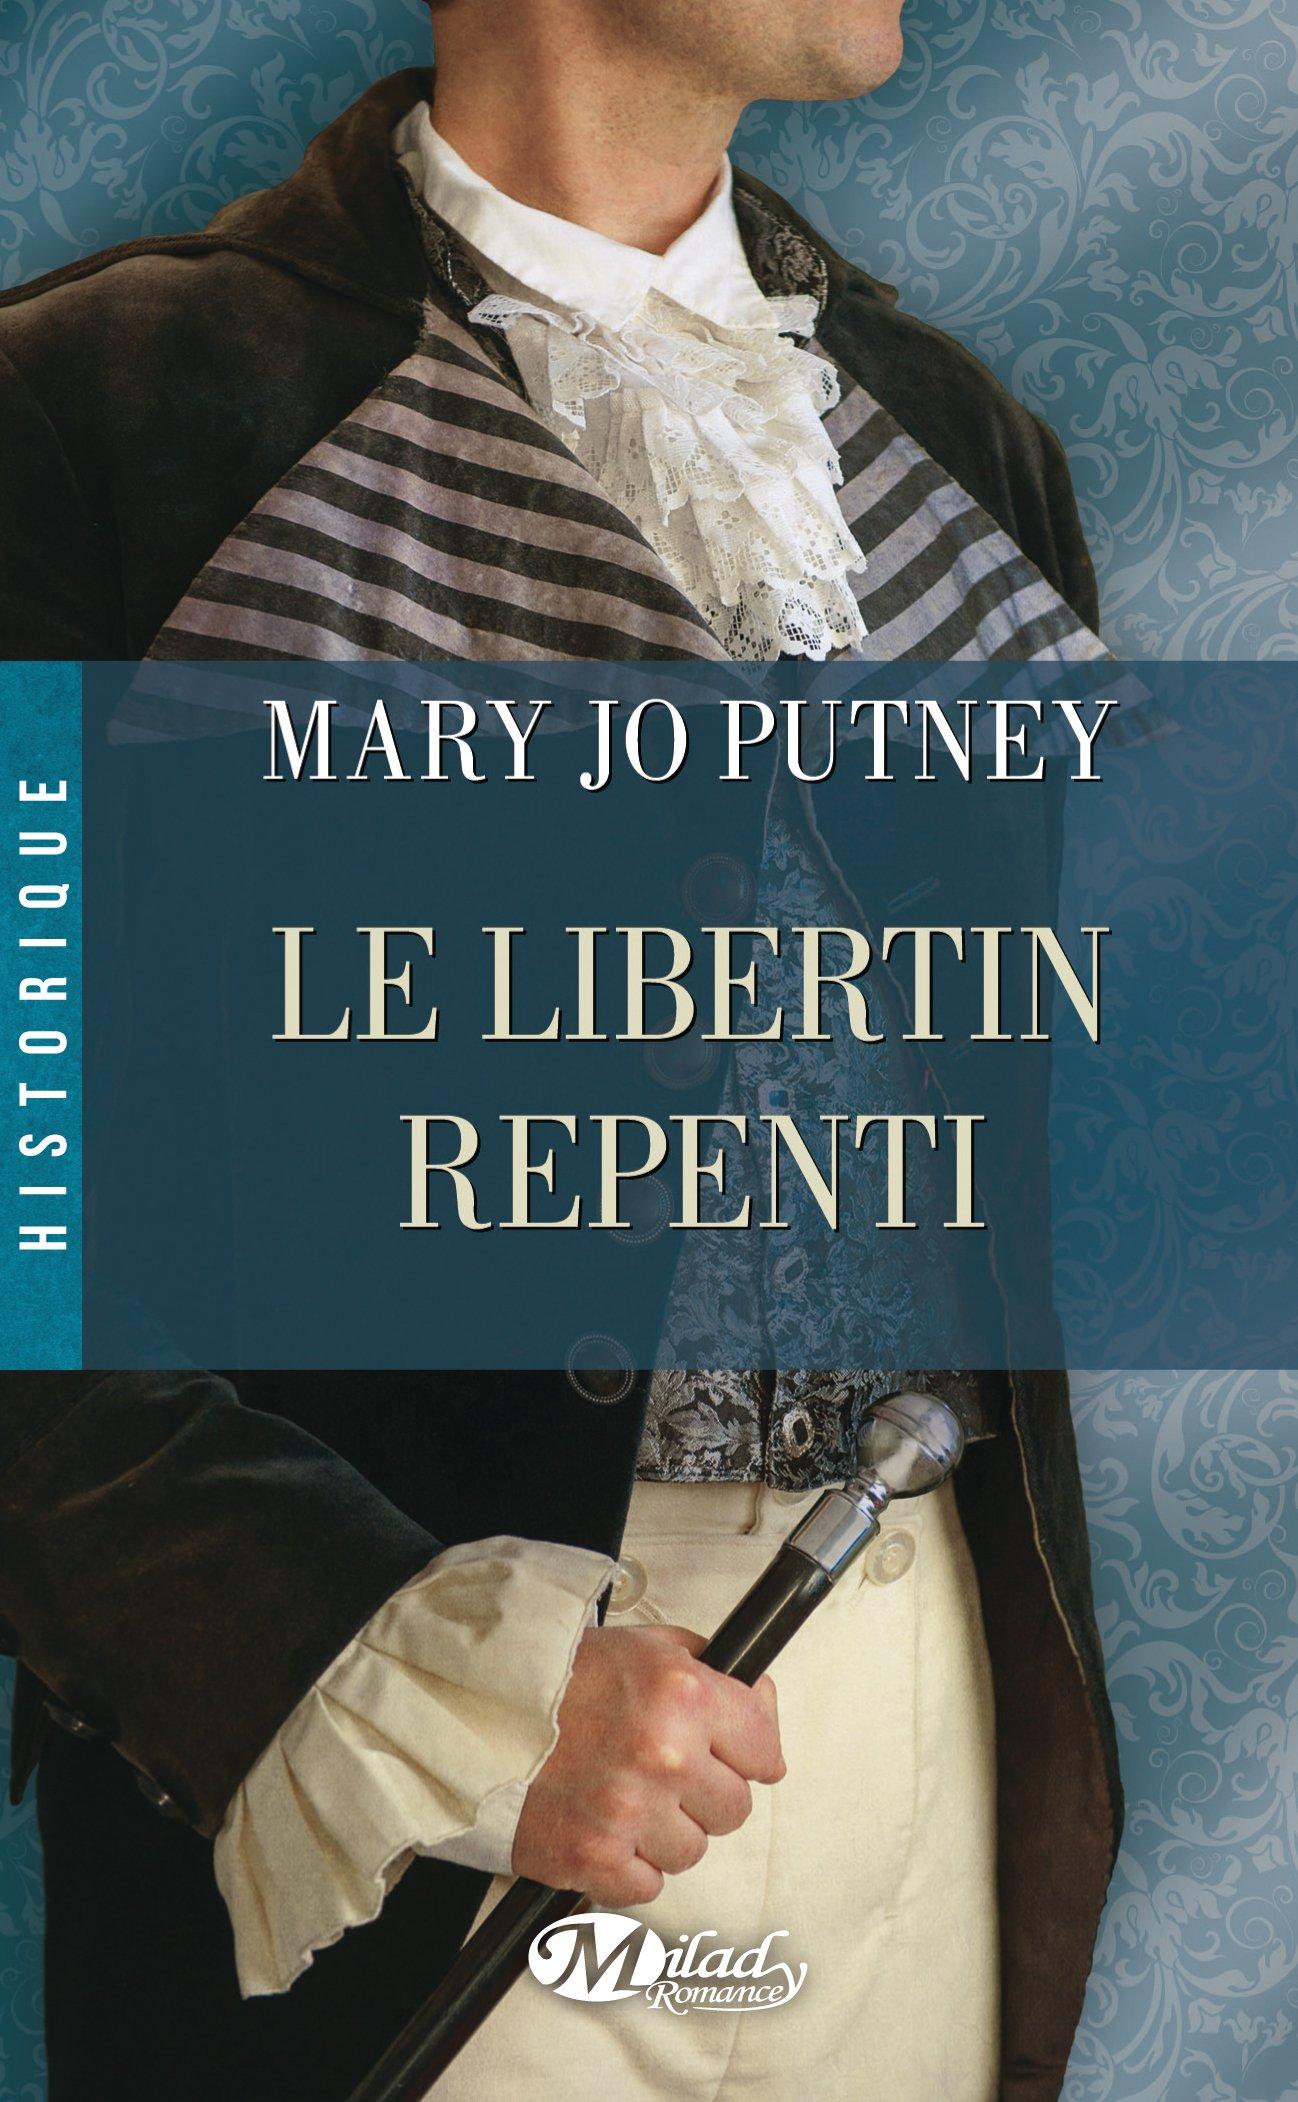 Le libertin repenti de Mary Jo Putney 81ybYTP0v-L